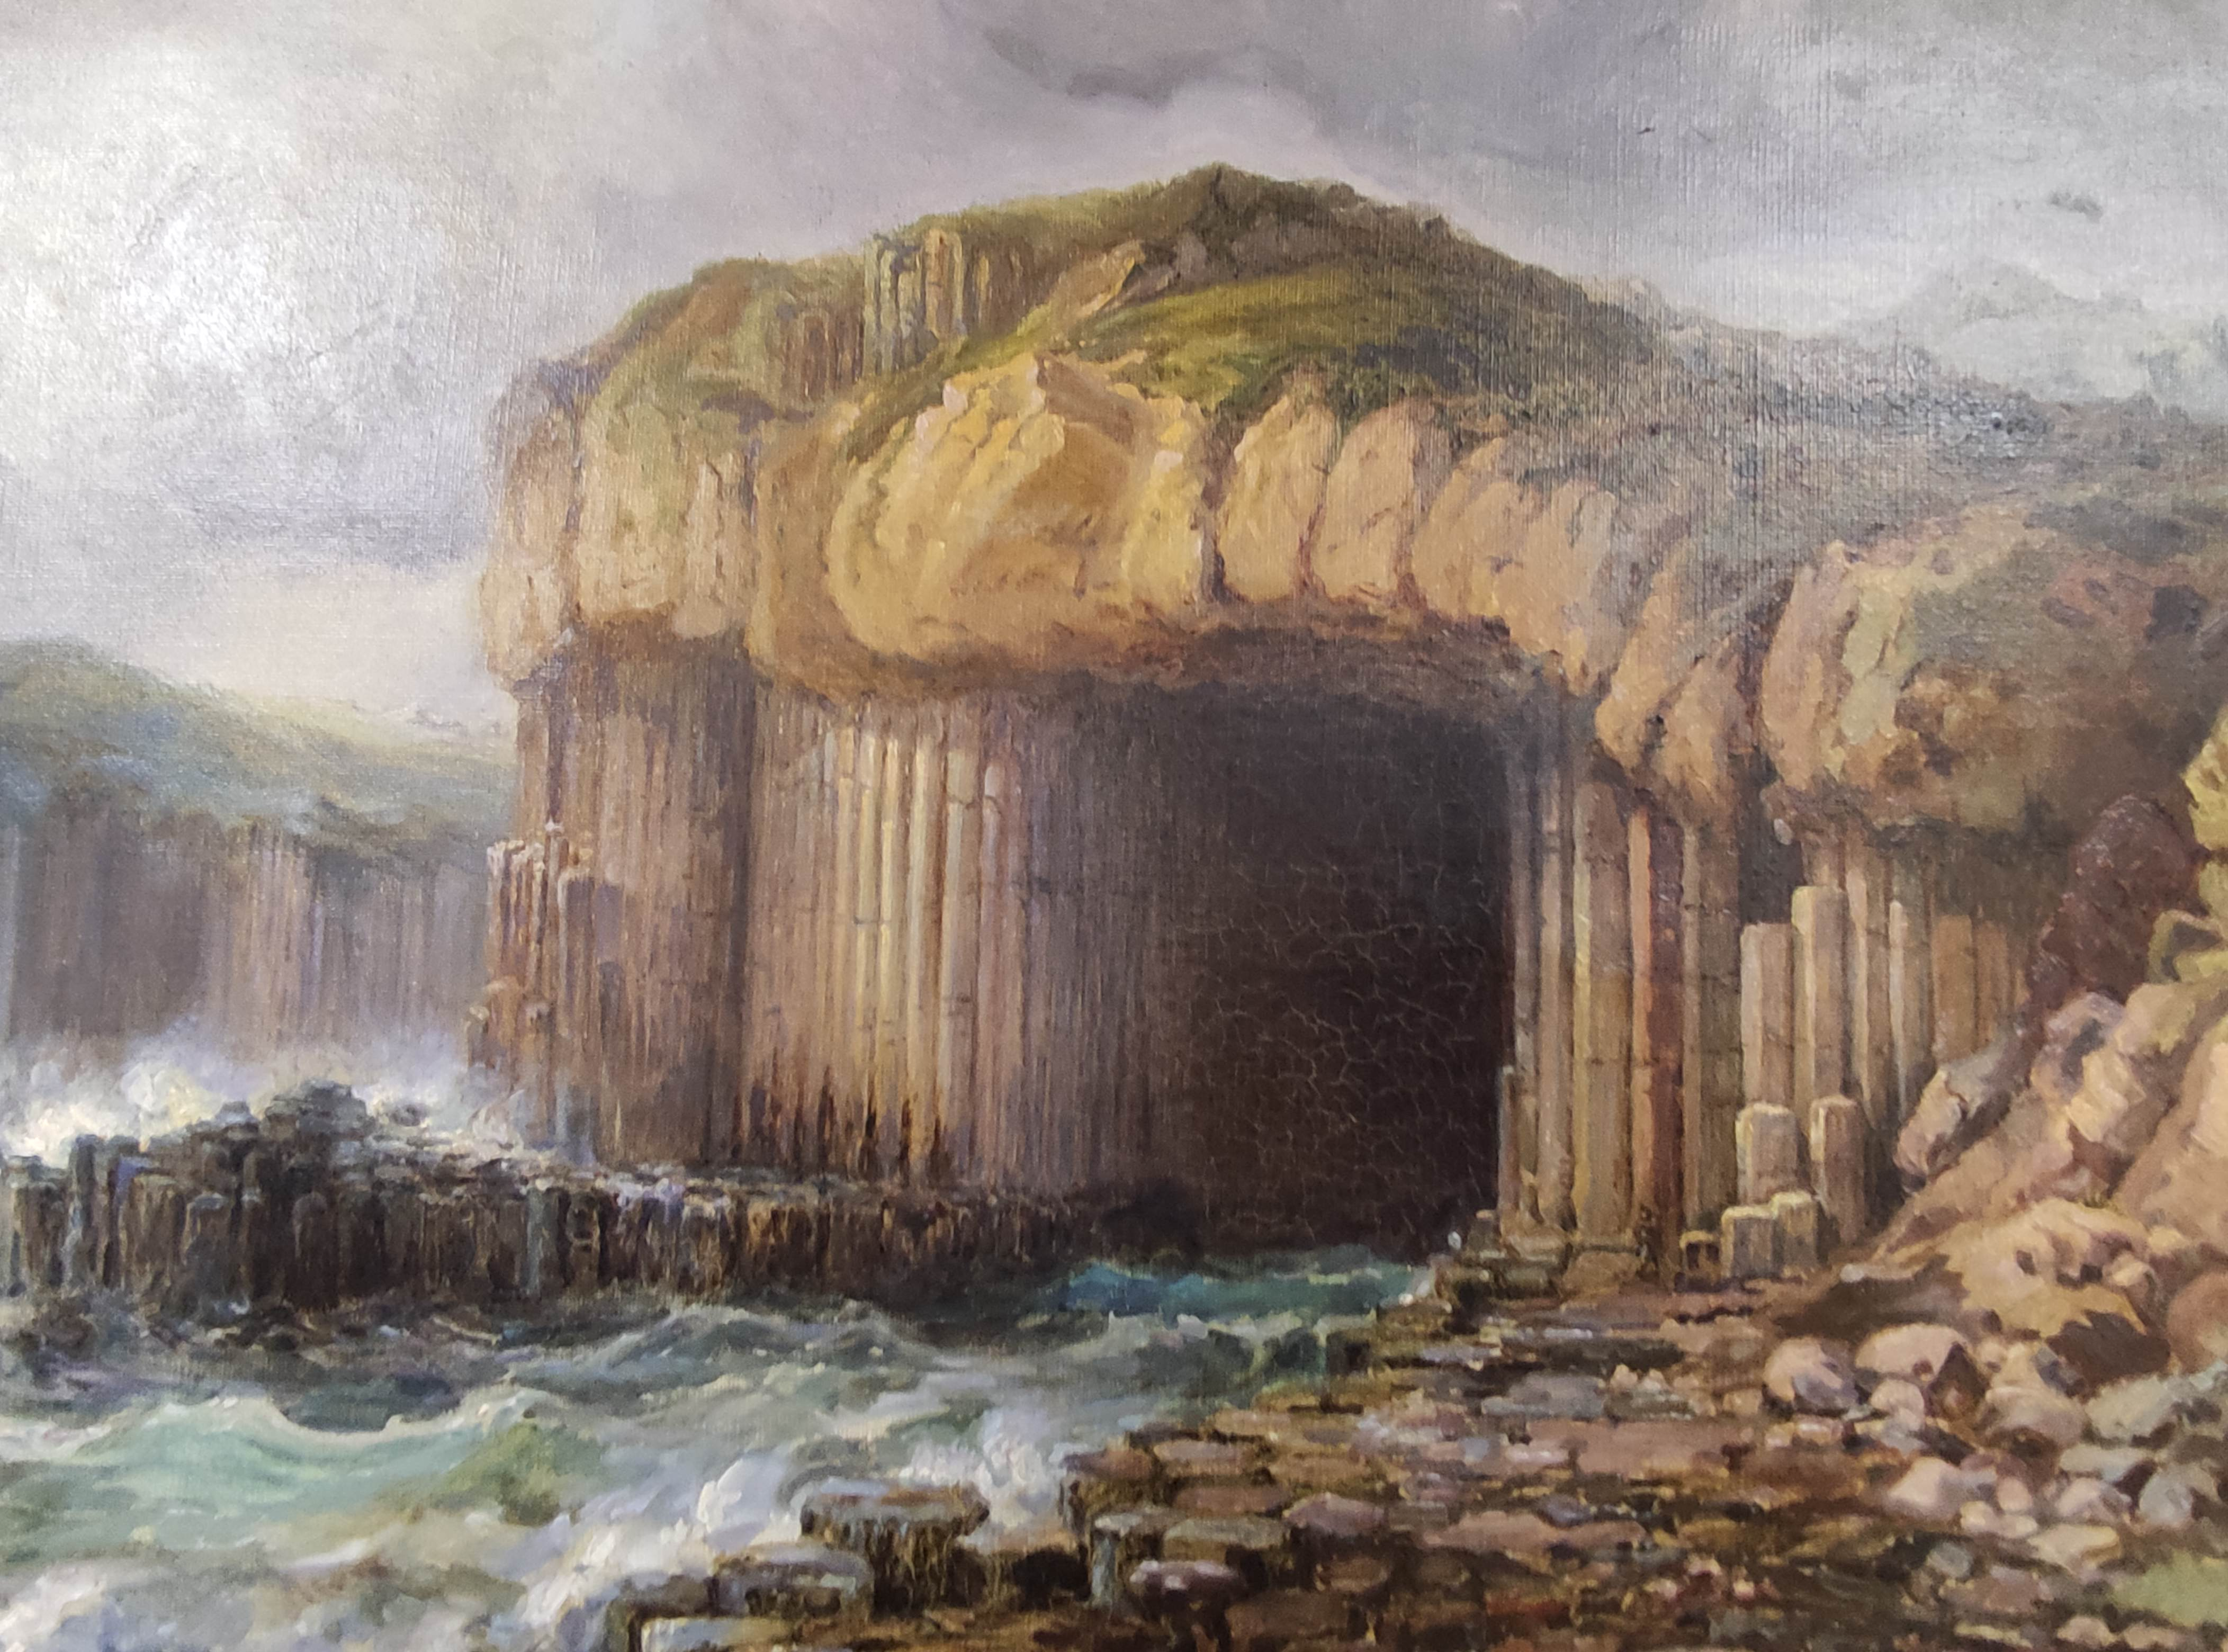 SCOTTISH SCHOOL C.1800. Fingals Cave, Staffa. Oil on canvas. 58cm x 88cm. - Image 3 of 4